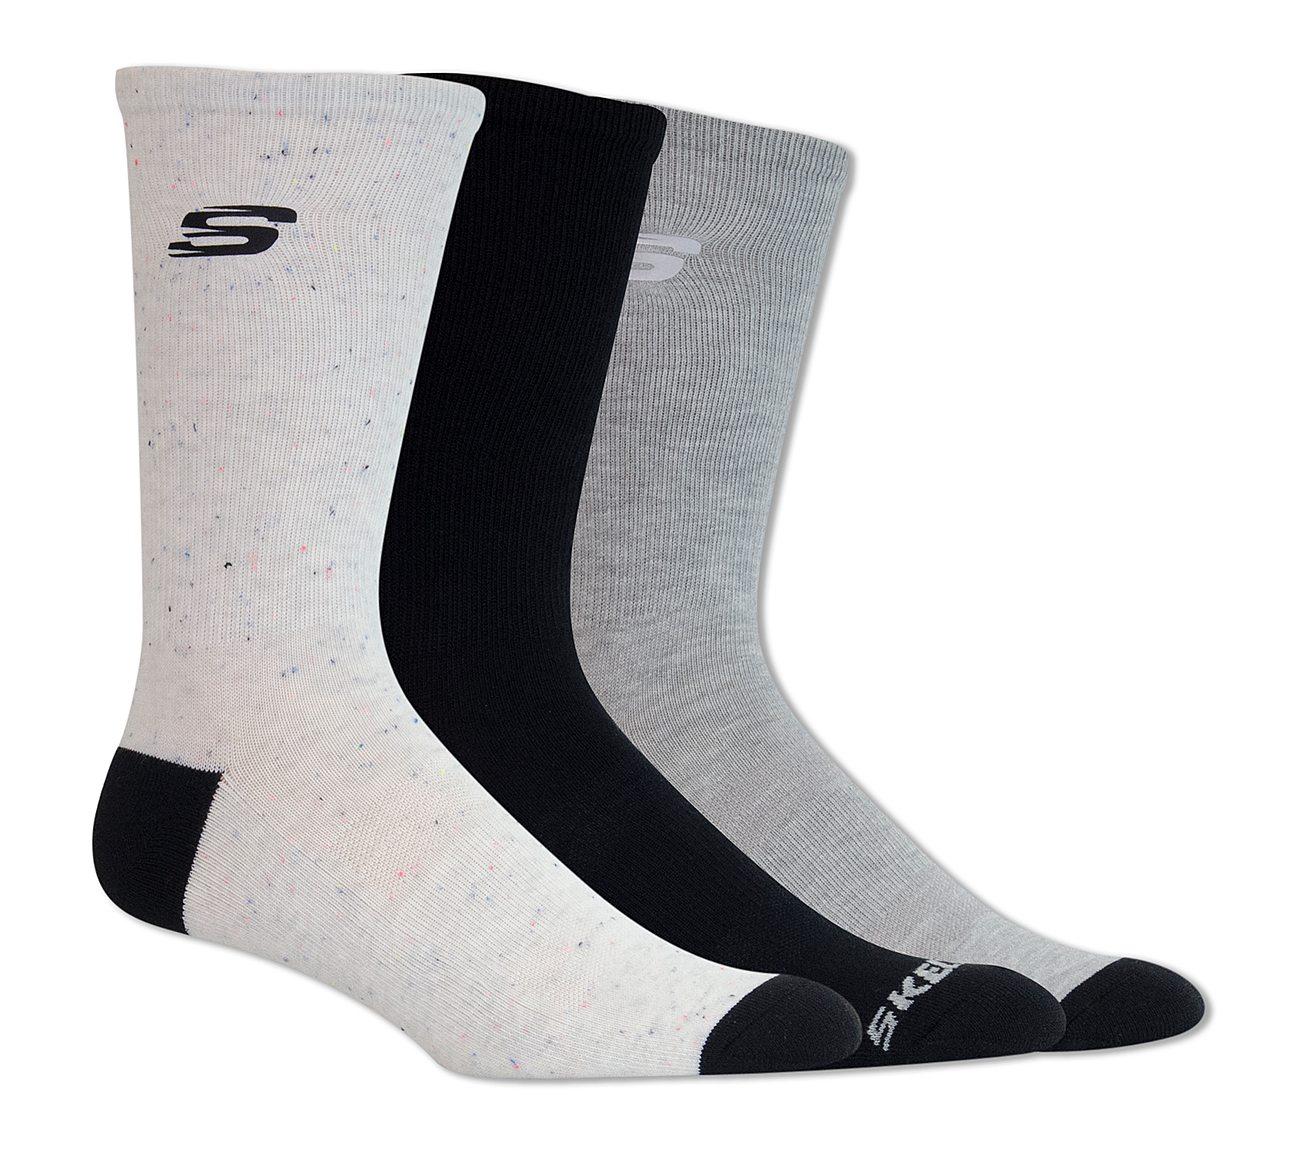 3 Pack Heathered Crew Socks